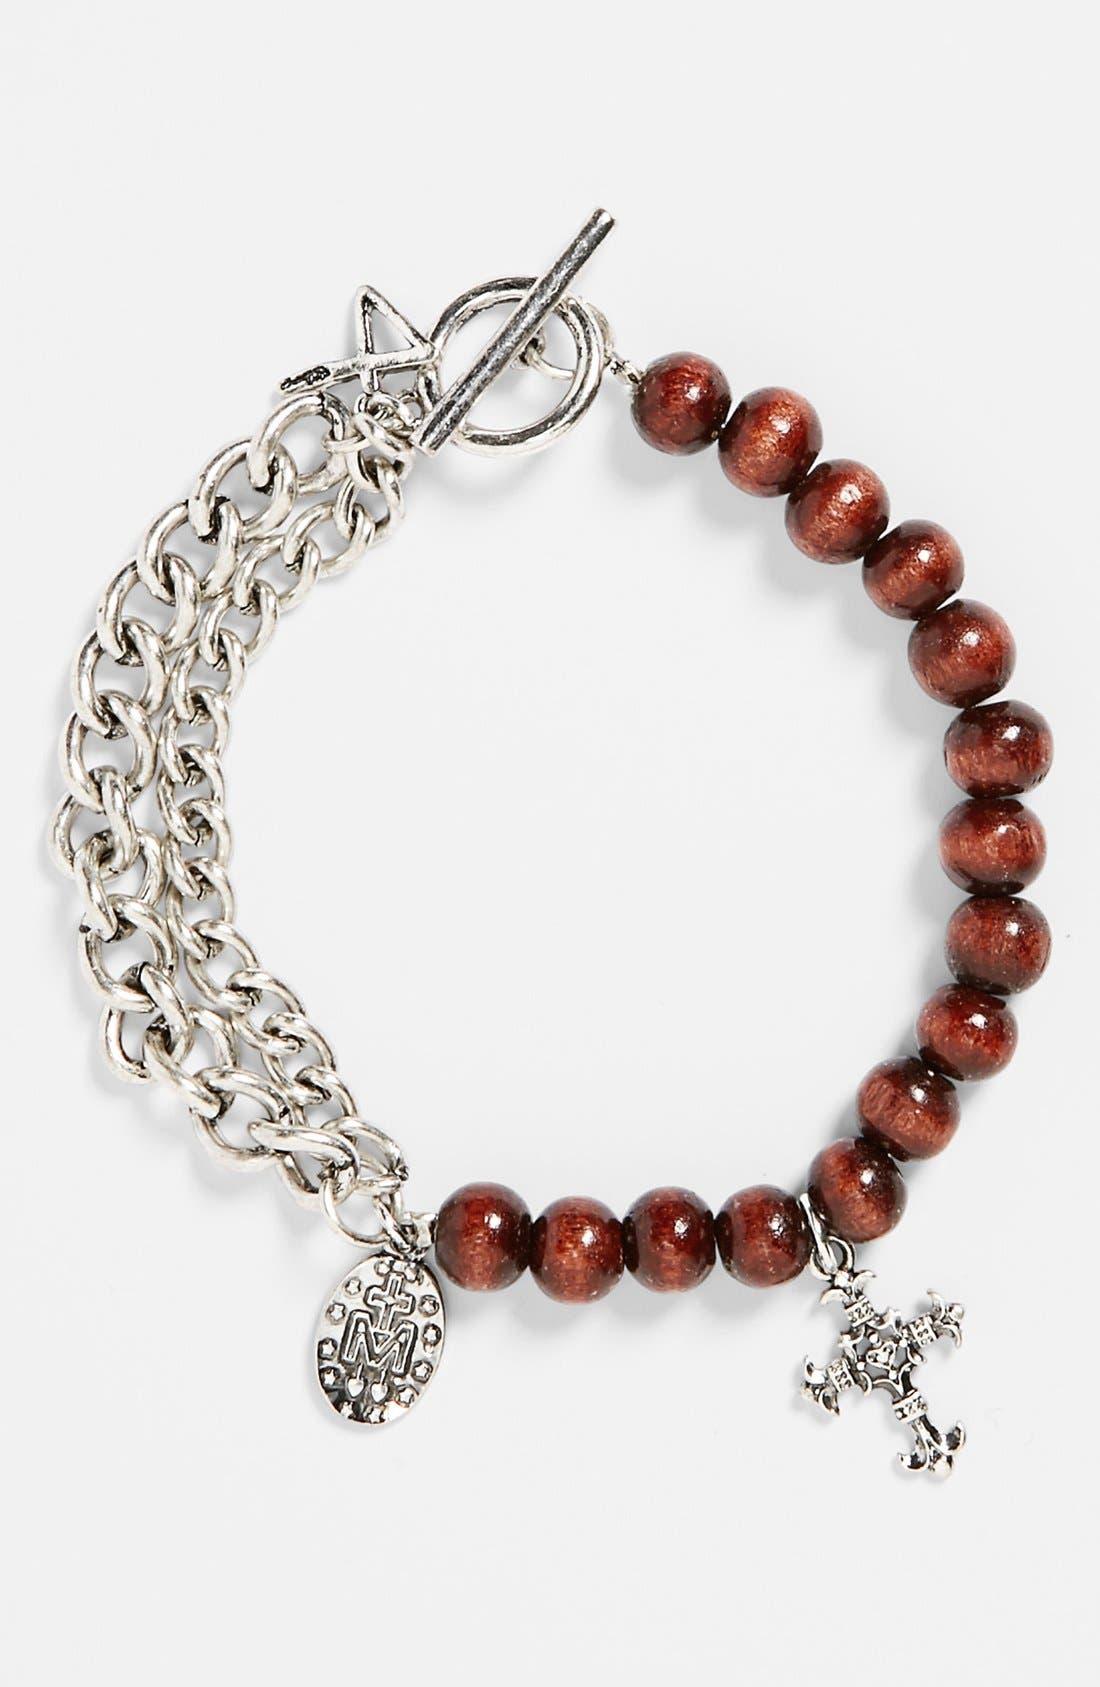 Main Image - Talon Chain Beaded Charm Bracelet